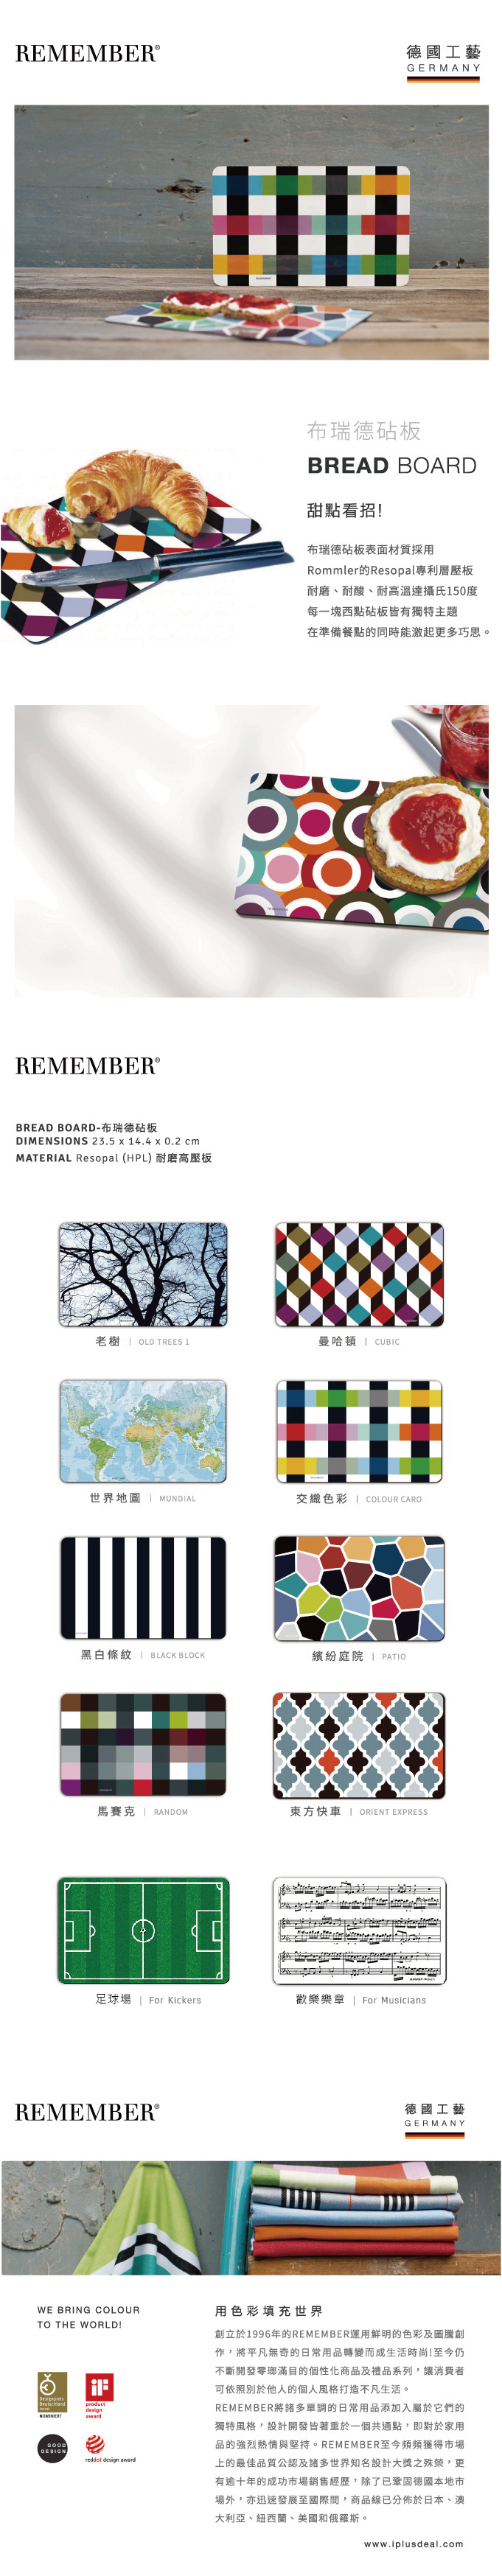 REMEMBER|布瑞德砧板-點心砧板(歡樂樂章)